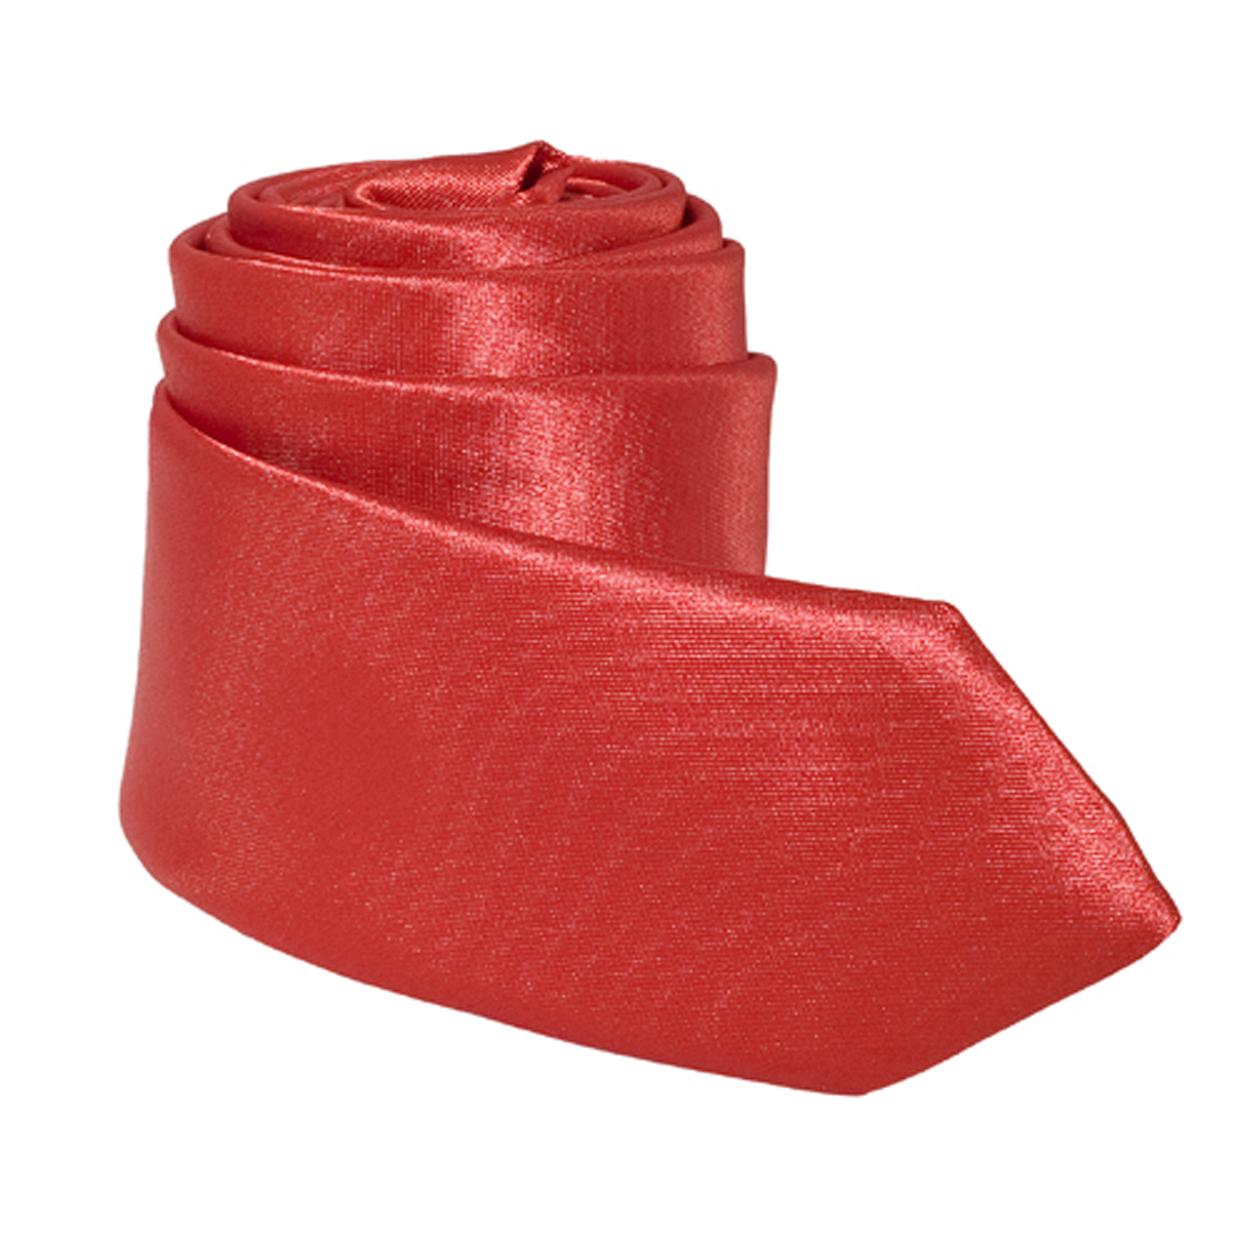 Cravate tendance slim rouge satinée